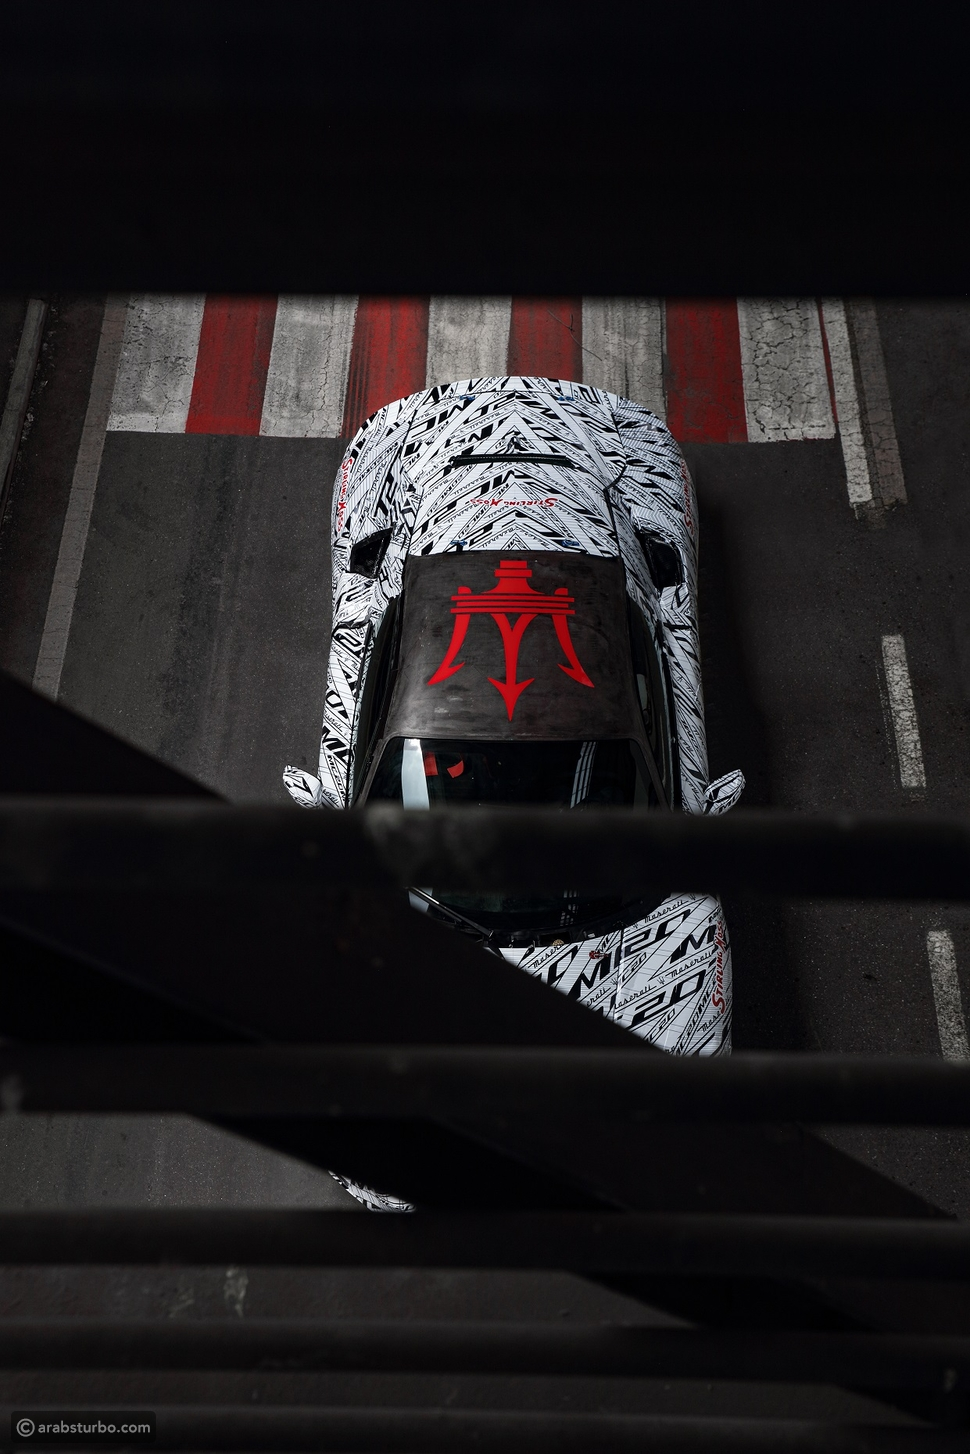 مازيراتي MC20: نموذج خاص لإحياء ذكرى السائق ستيرلينج موس